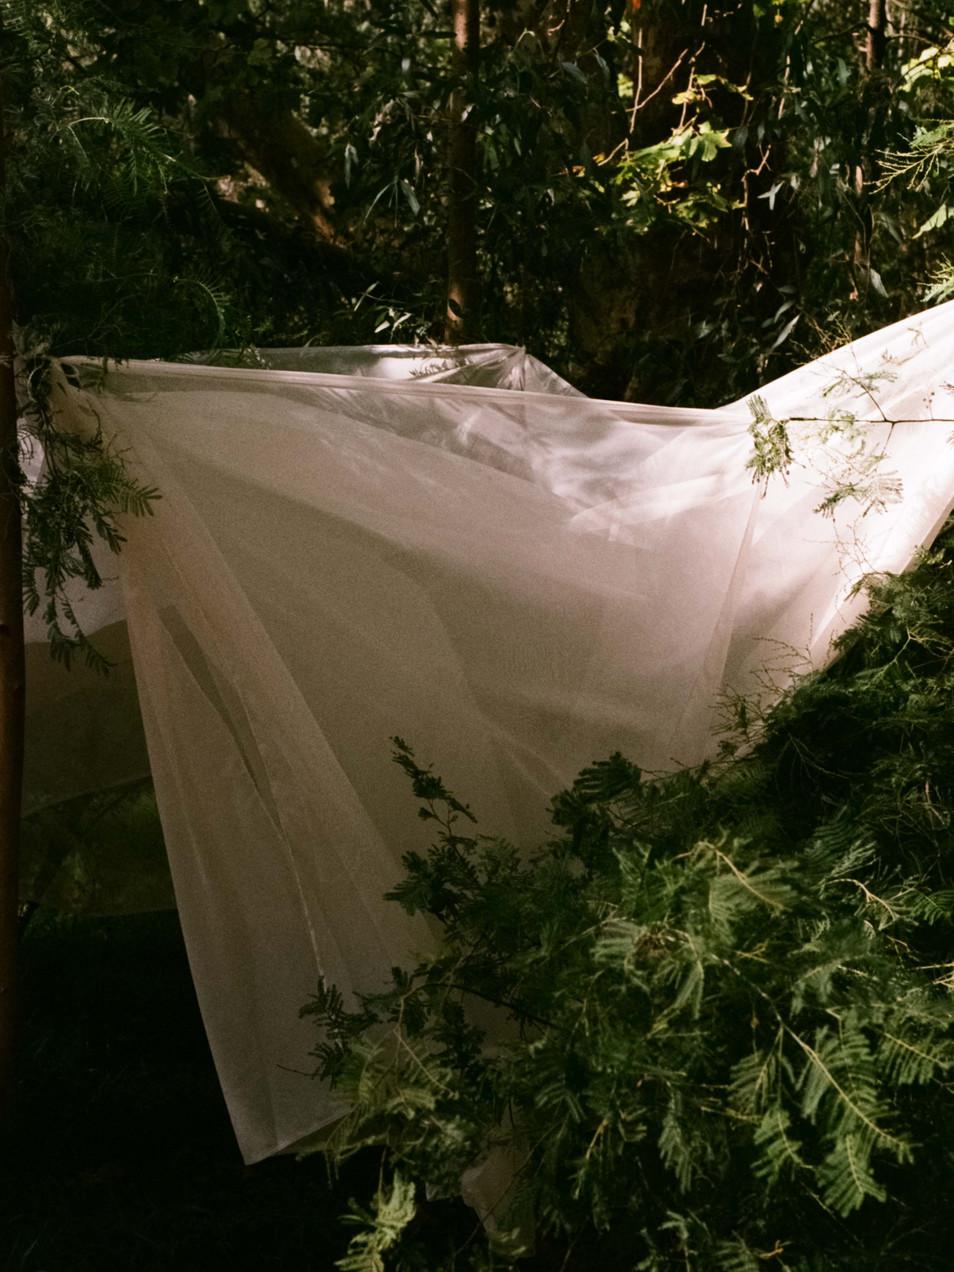 Rachel-Jayne-Mackay_Fabric-Trees_01.jpg